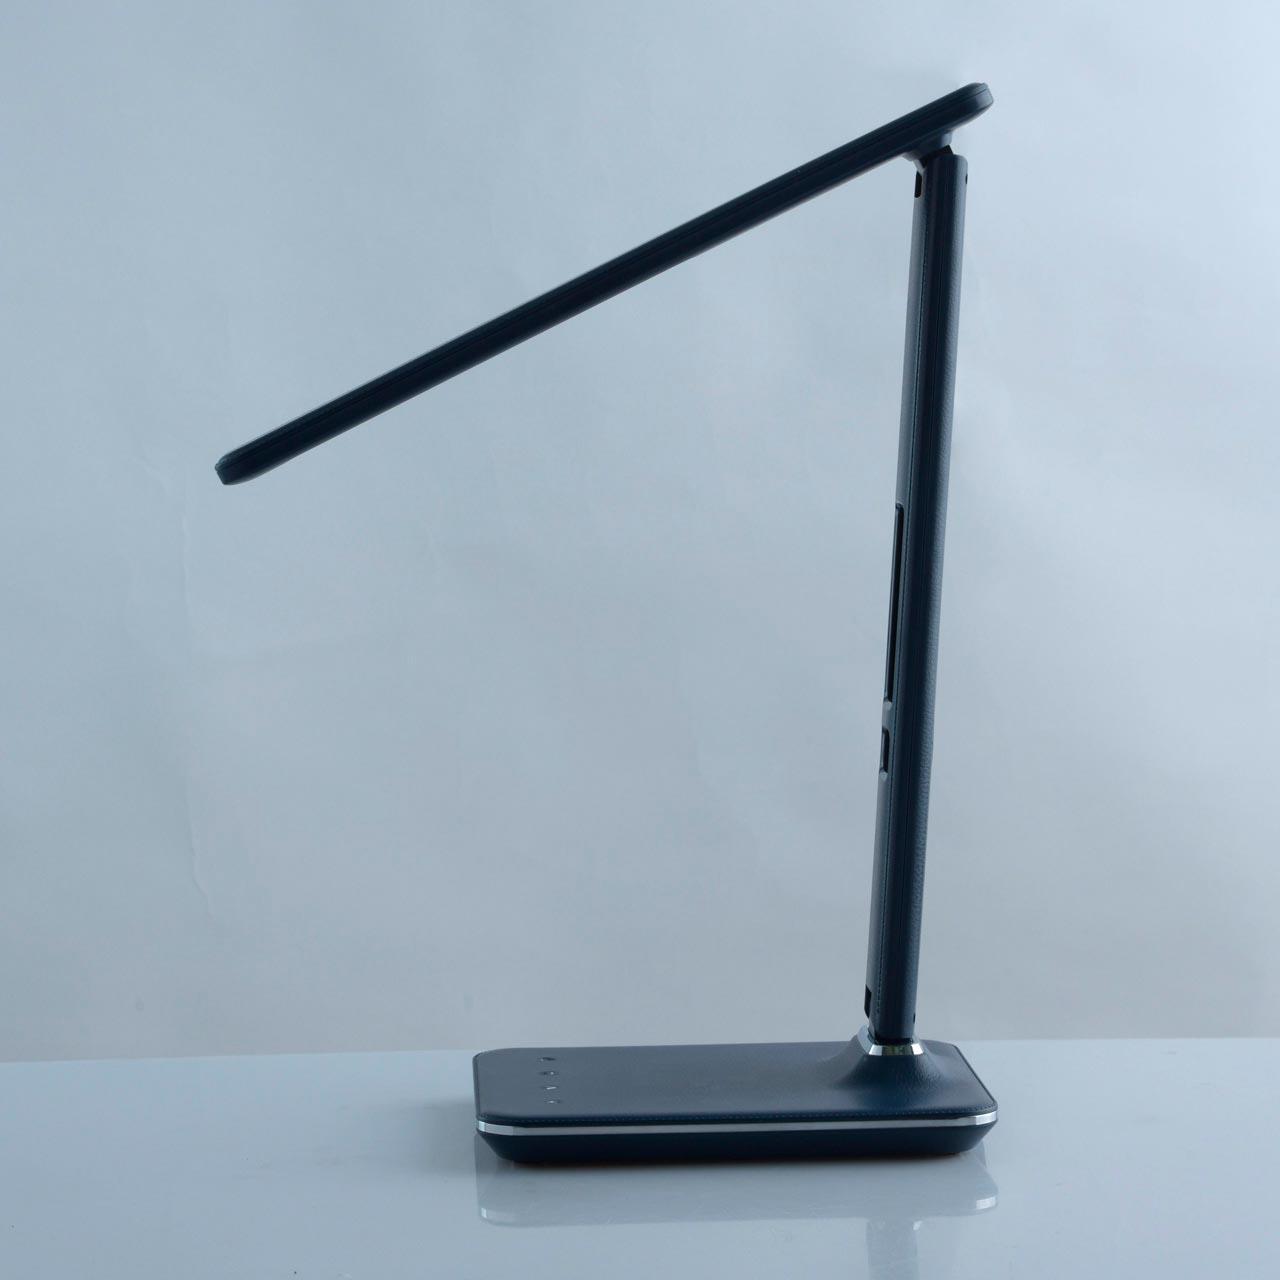 Настольная лампа DeMarkt(Ракурс) 631036401 - цена, купить ...